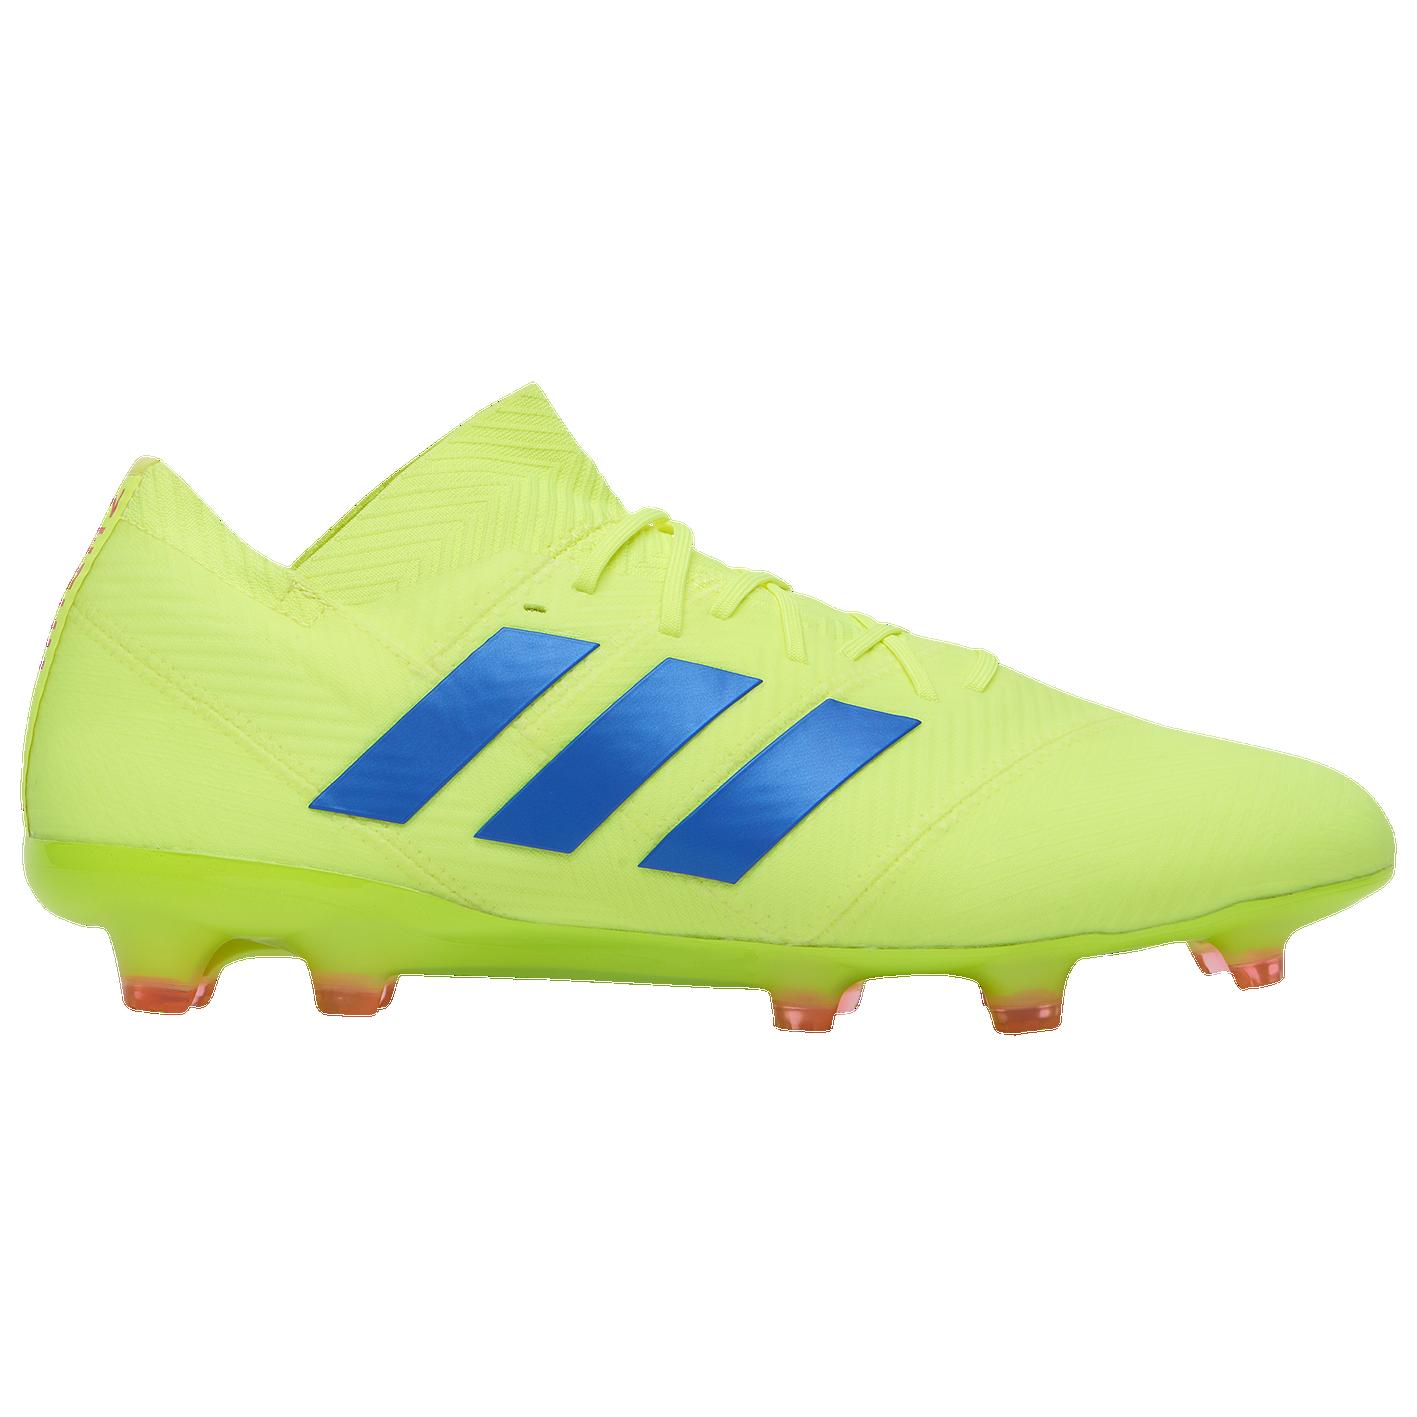 7ba7b1dfeed adidas Nemeziz 18.1 FG - Men s - Soccer - Shoes - Solar Yellow Blue ...